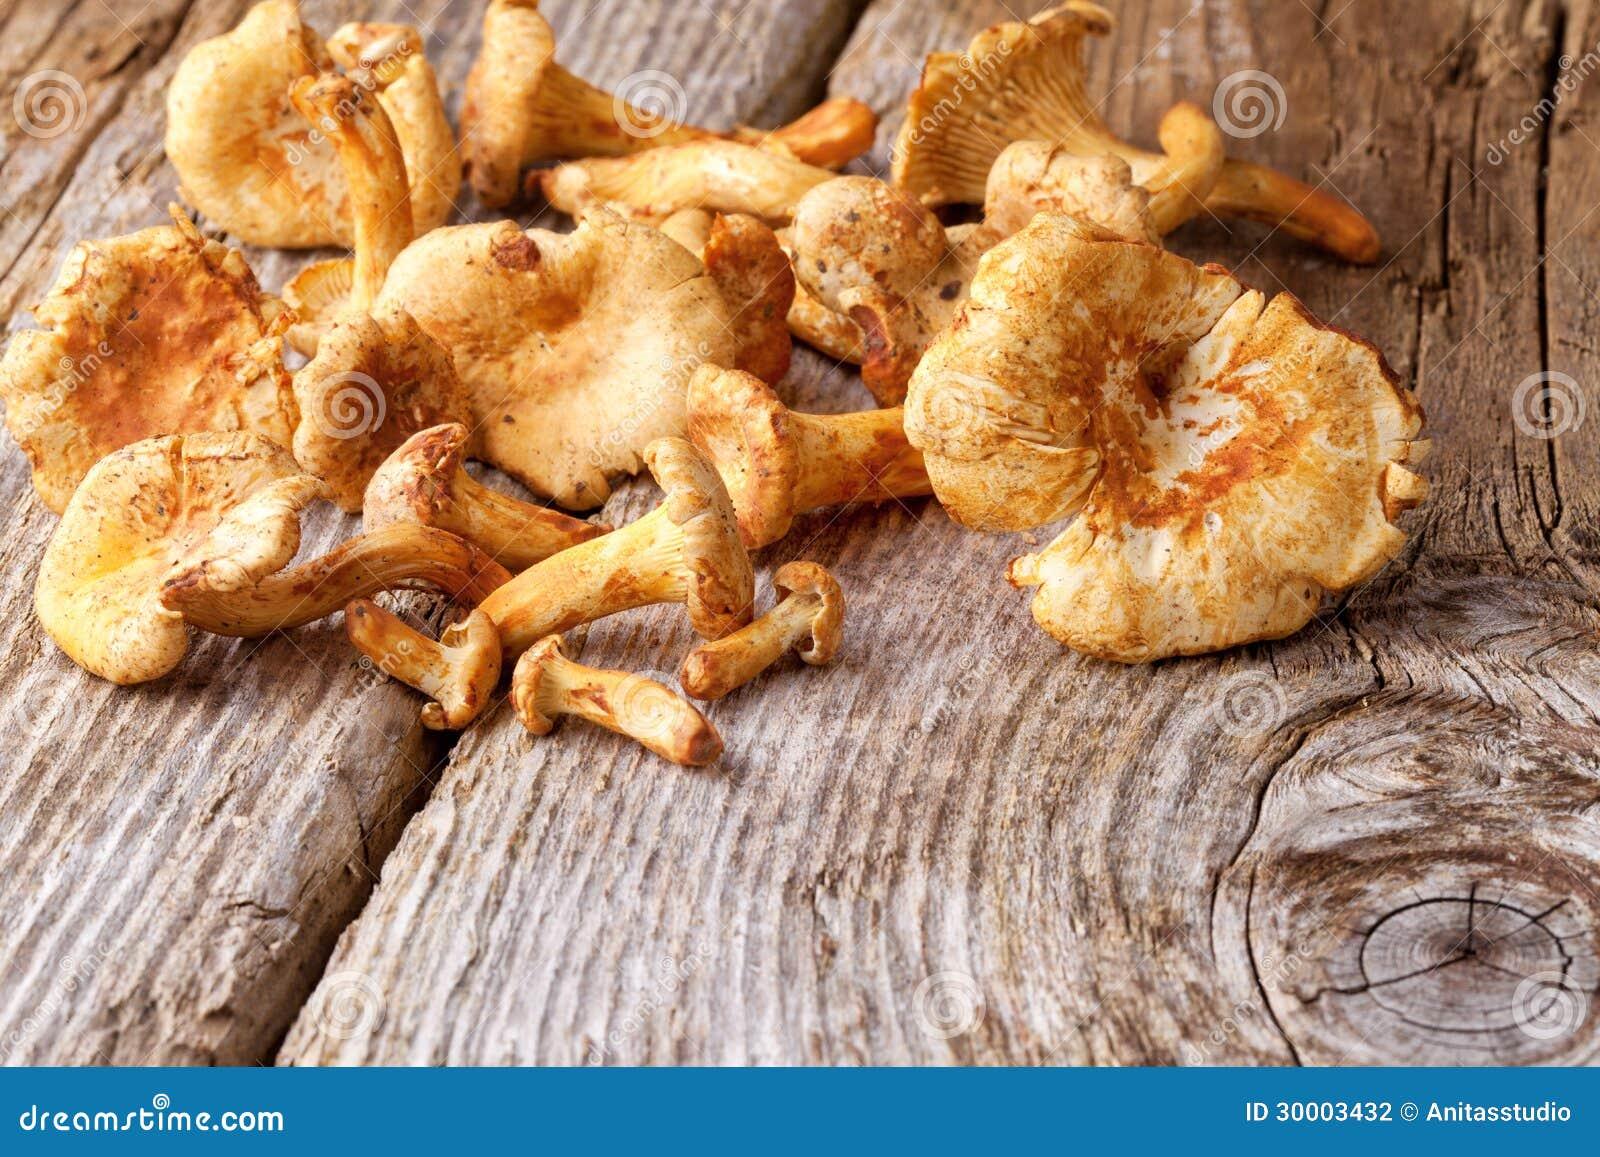 Chanterelles Mushroom Stock Photography - Image: 30003432